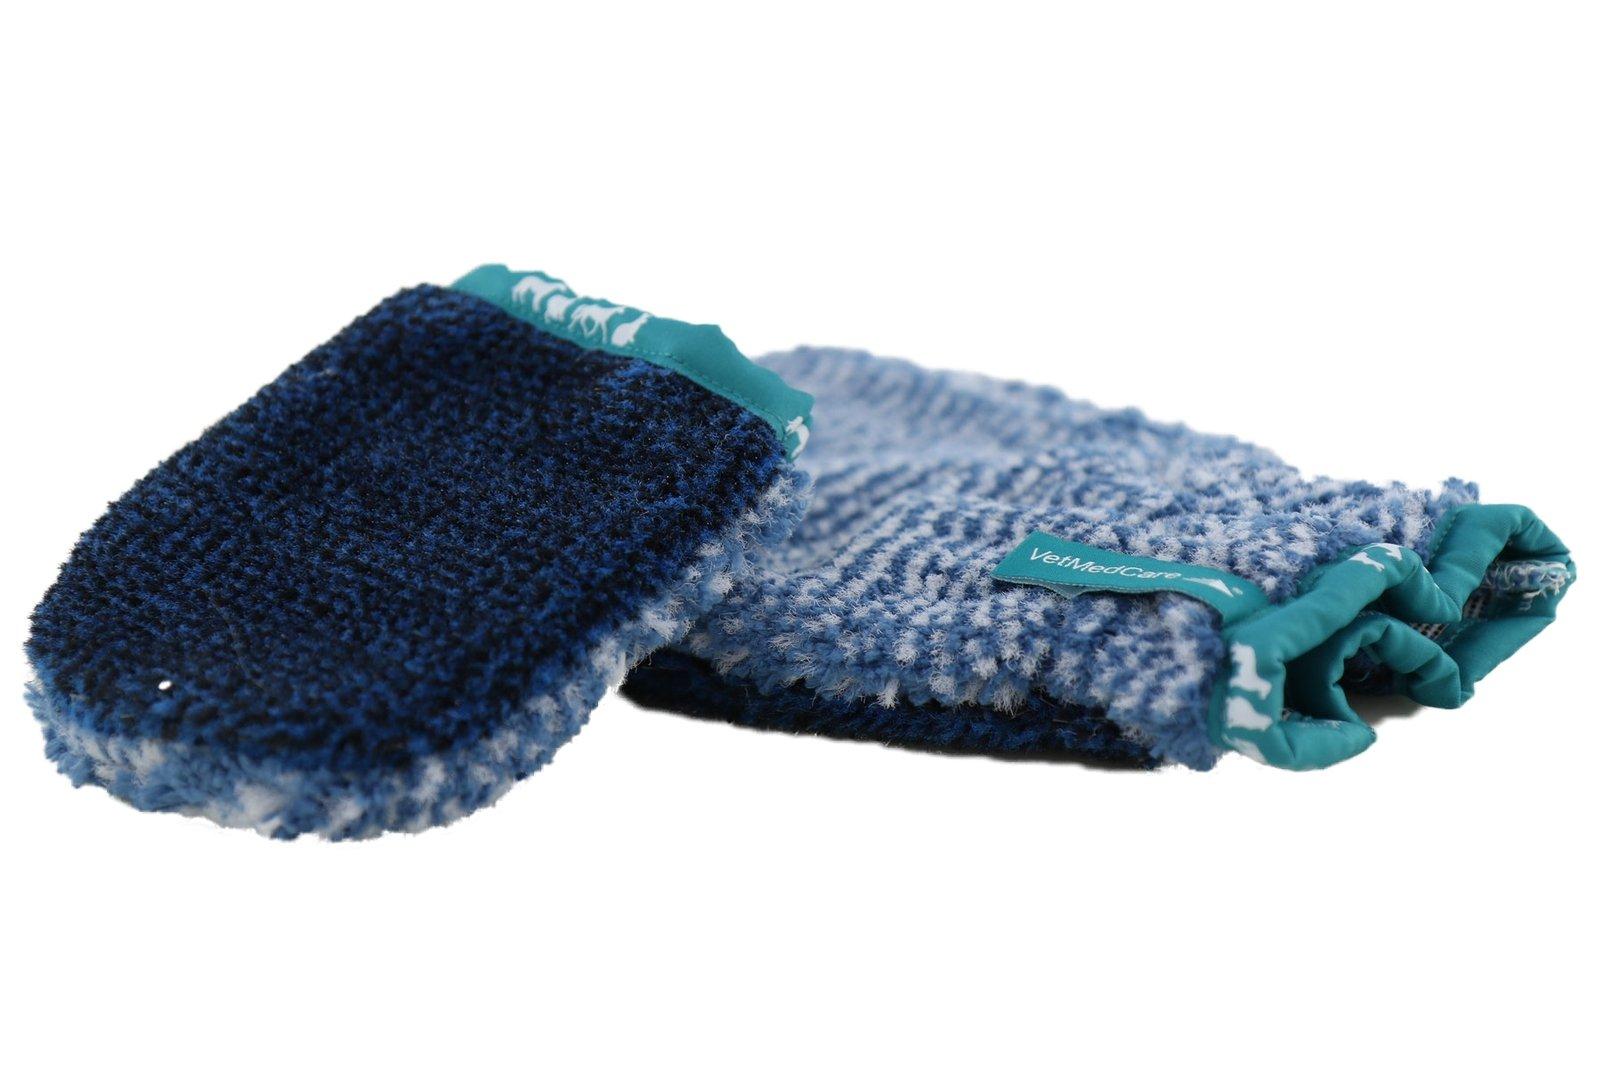 Fellpflegehandschuh Grooming Glove L